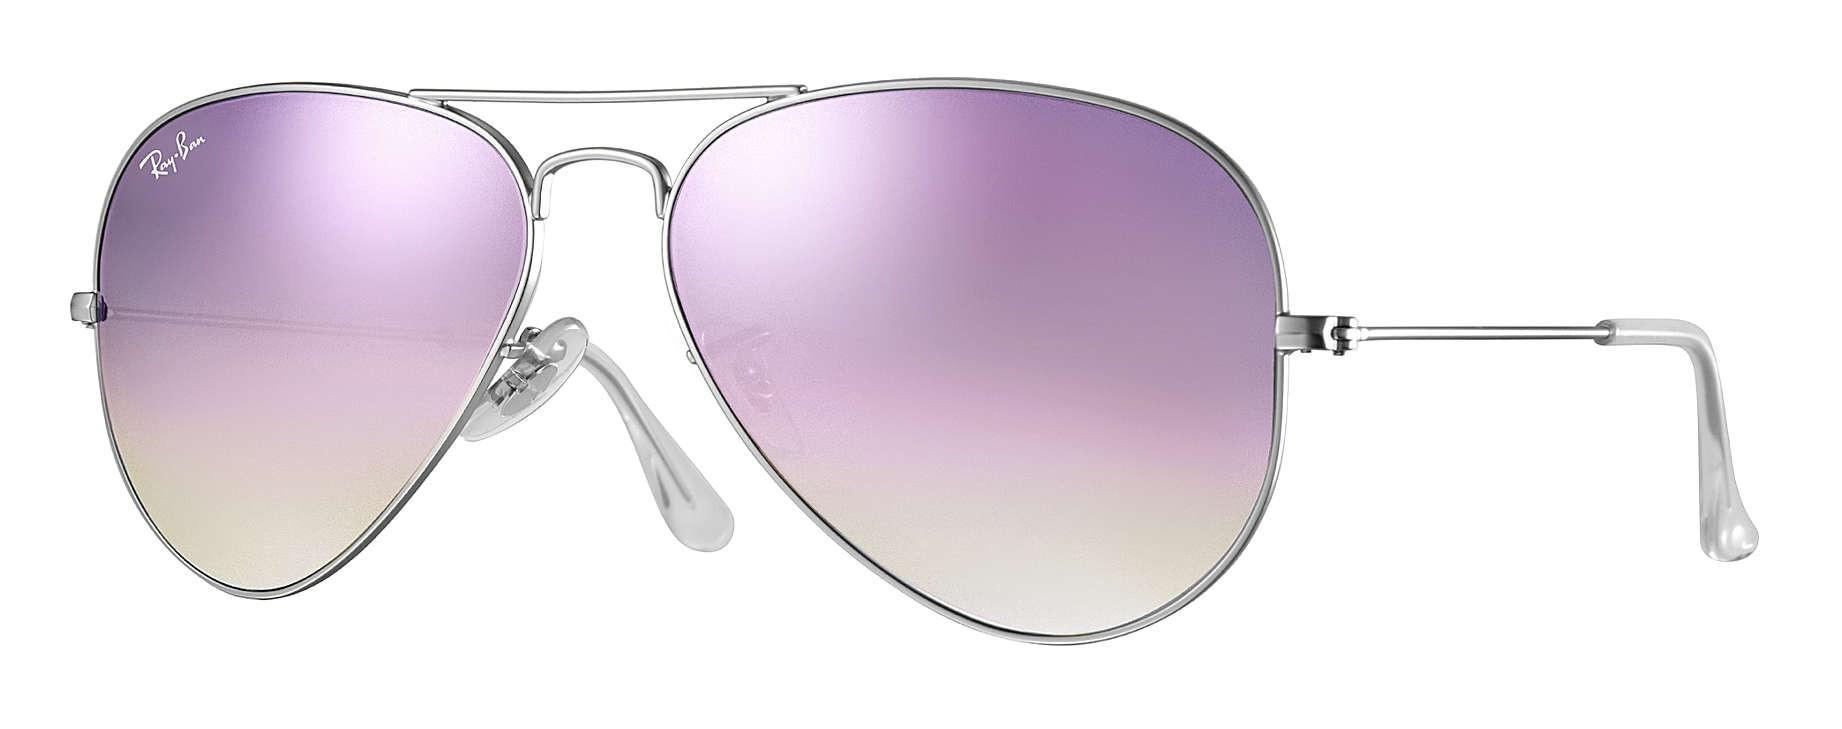 6f73044c67 Ray-Ban - RB3025 019 7X - Original Aviator Flash Lenses Gradient - Silver -  Lilac Gradient Flash Lenses - Sunglasses - Eyewear - Avvenice